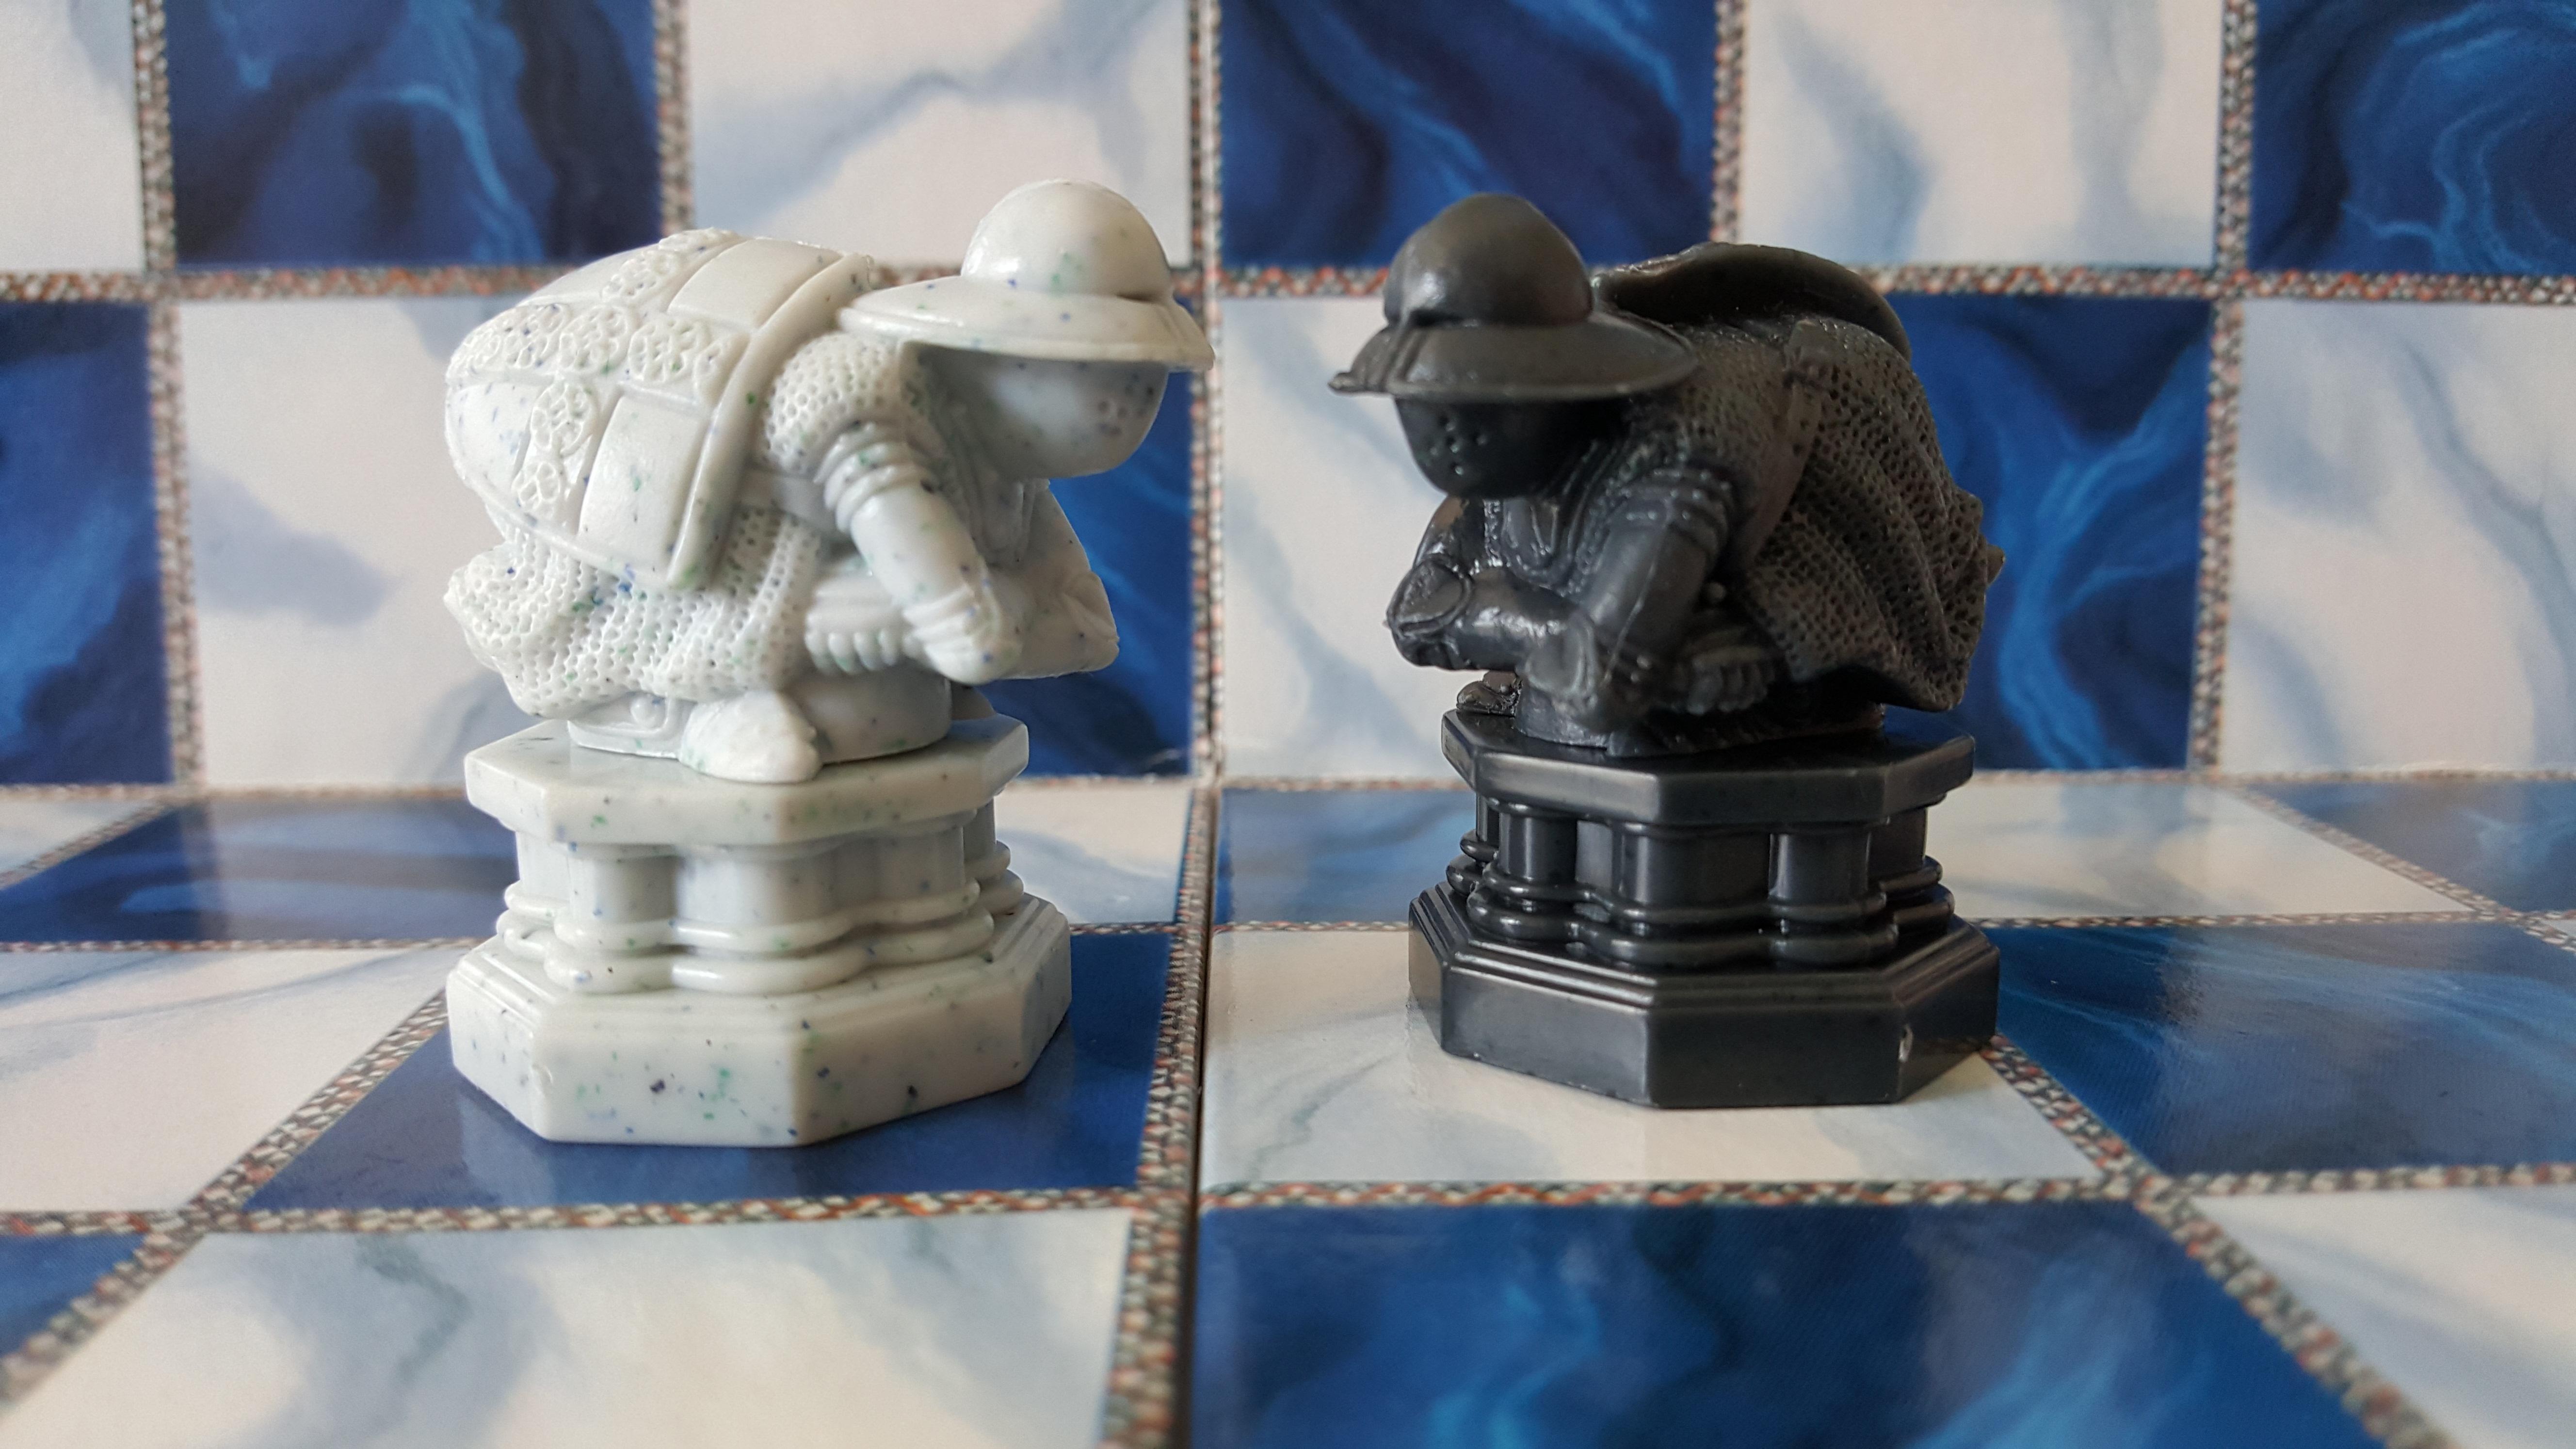 Fotos Gratis Juego Monumento Estatua Azul Juguete Harry